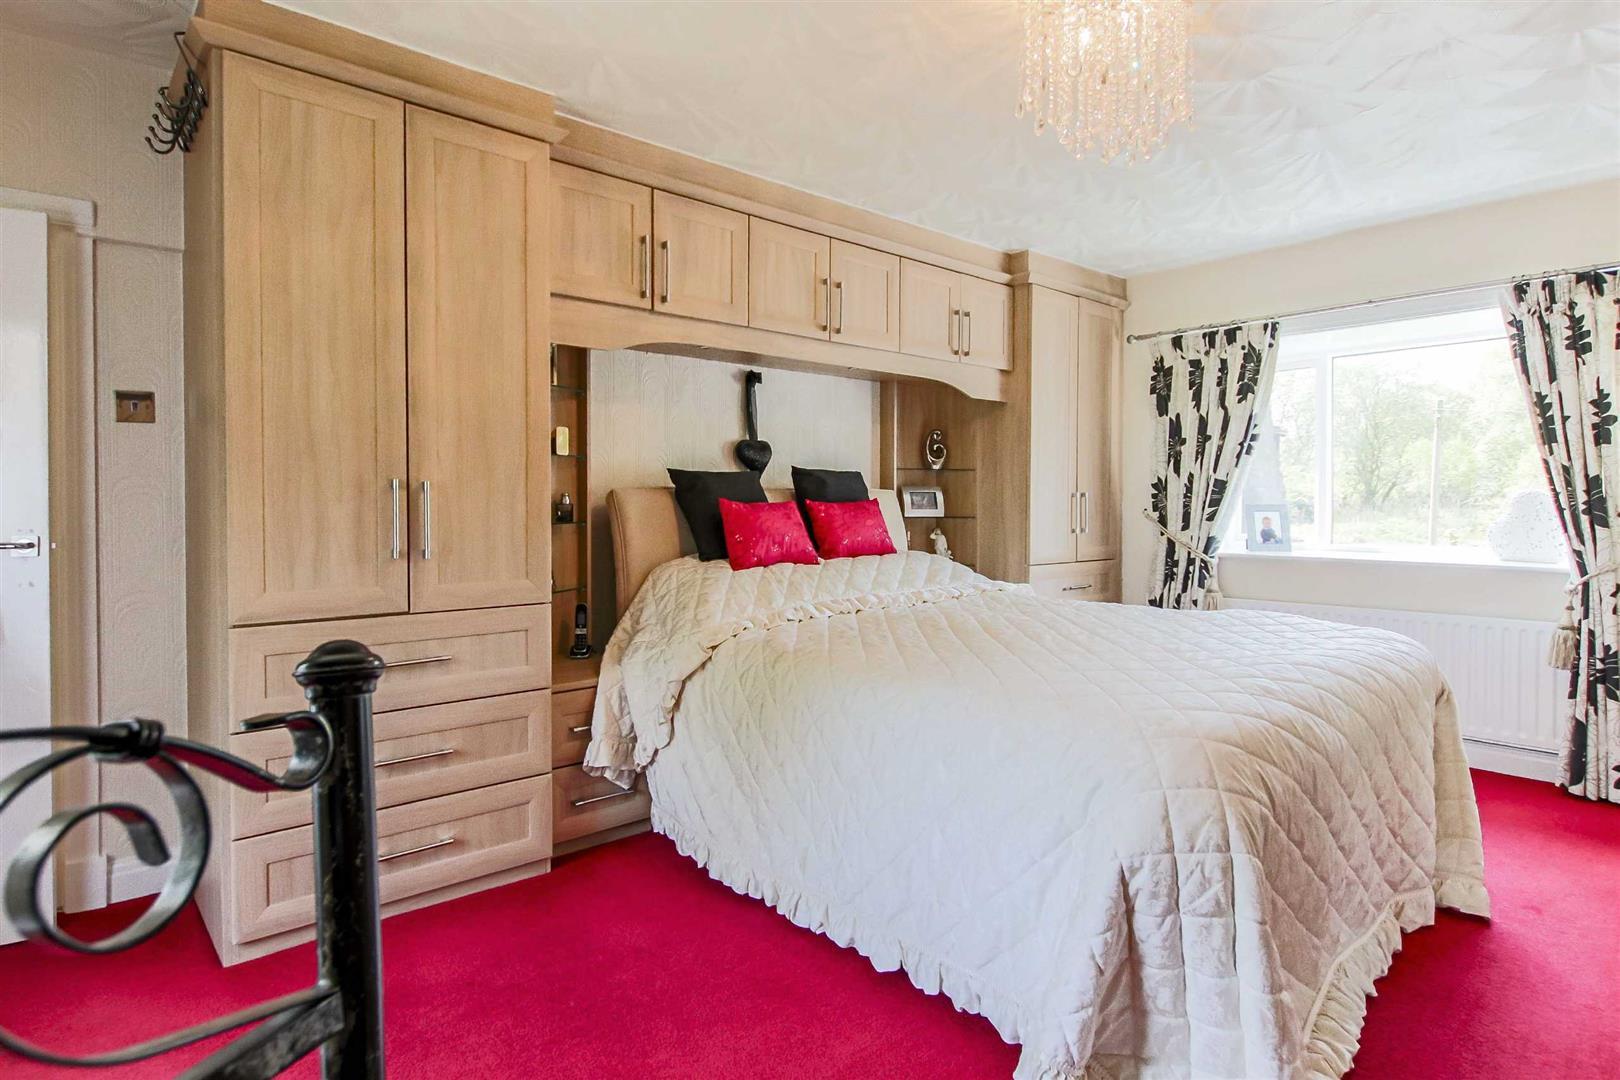 4 Bedroom Detached House For Sale - p006990_05.jpg